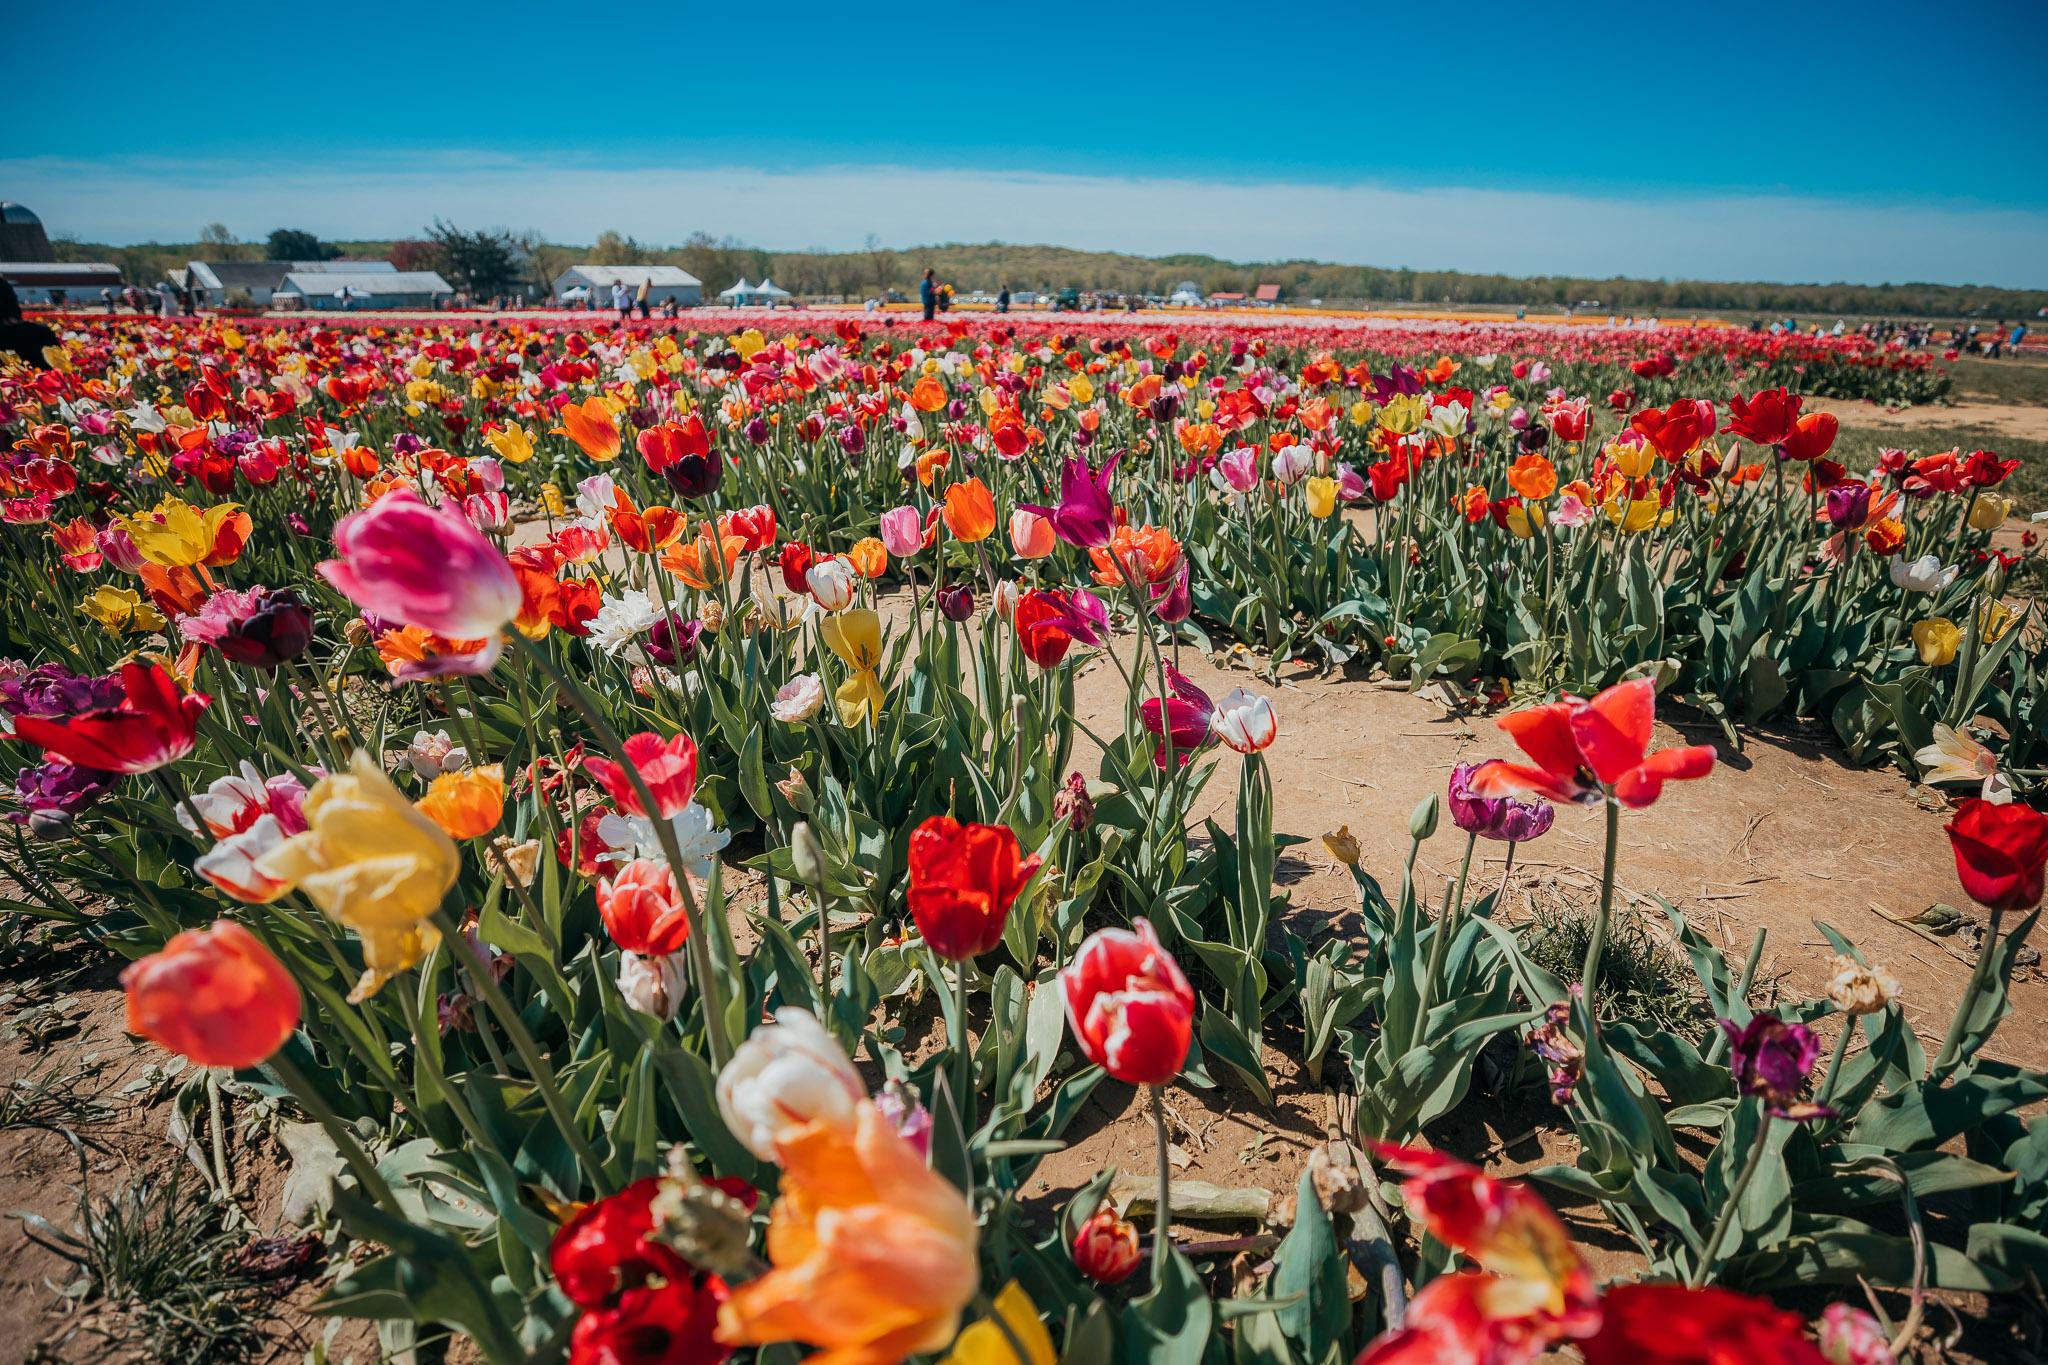 Tulips-4831.jpg